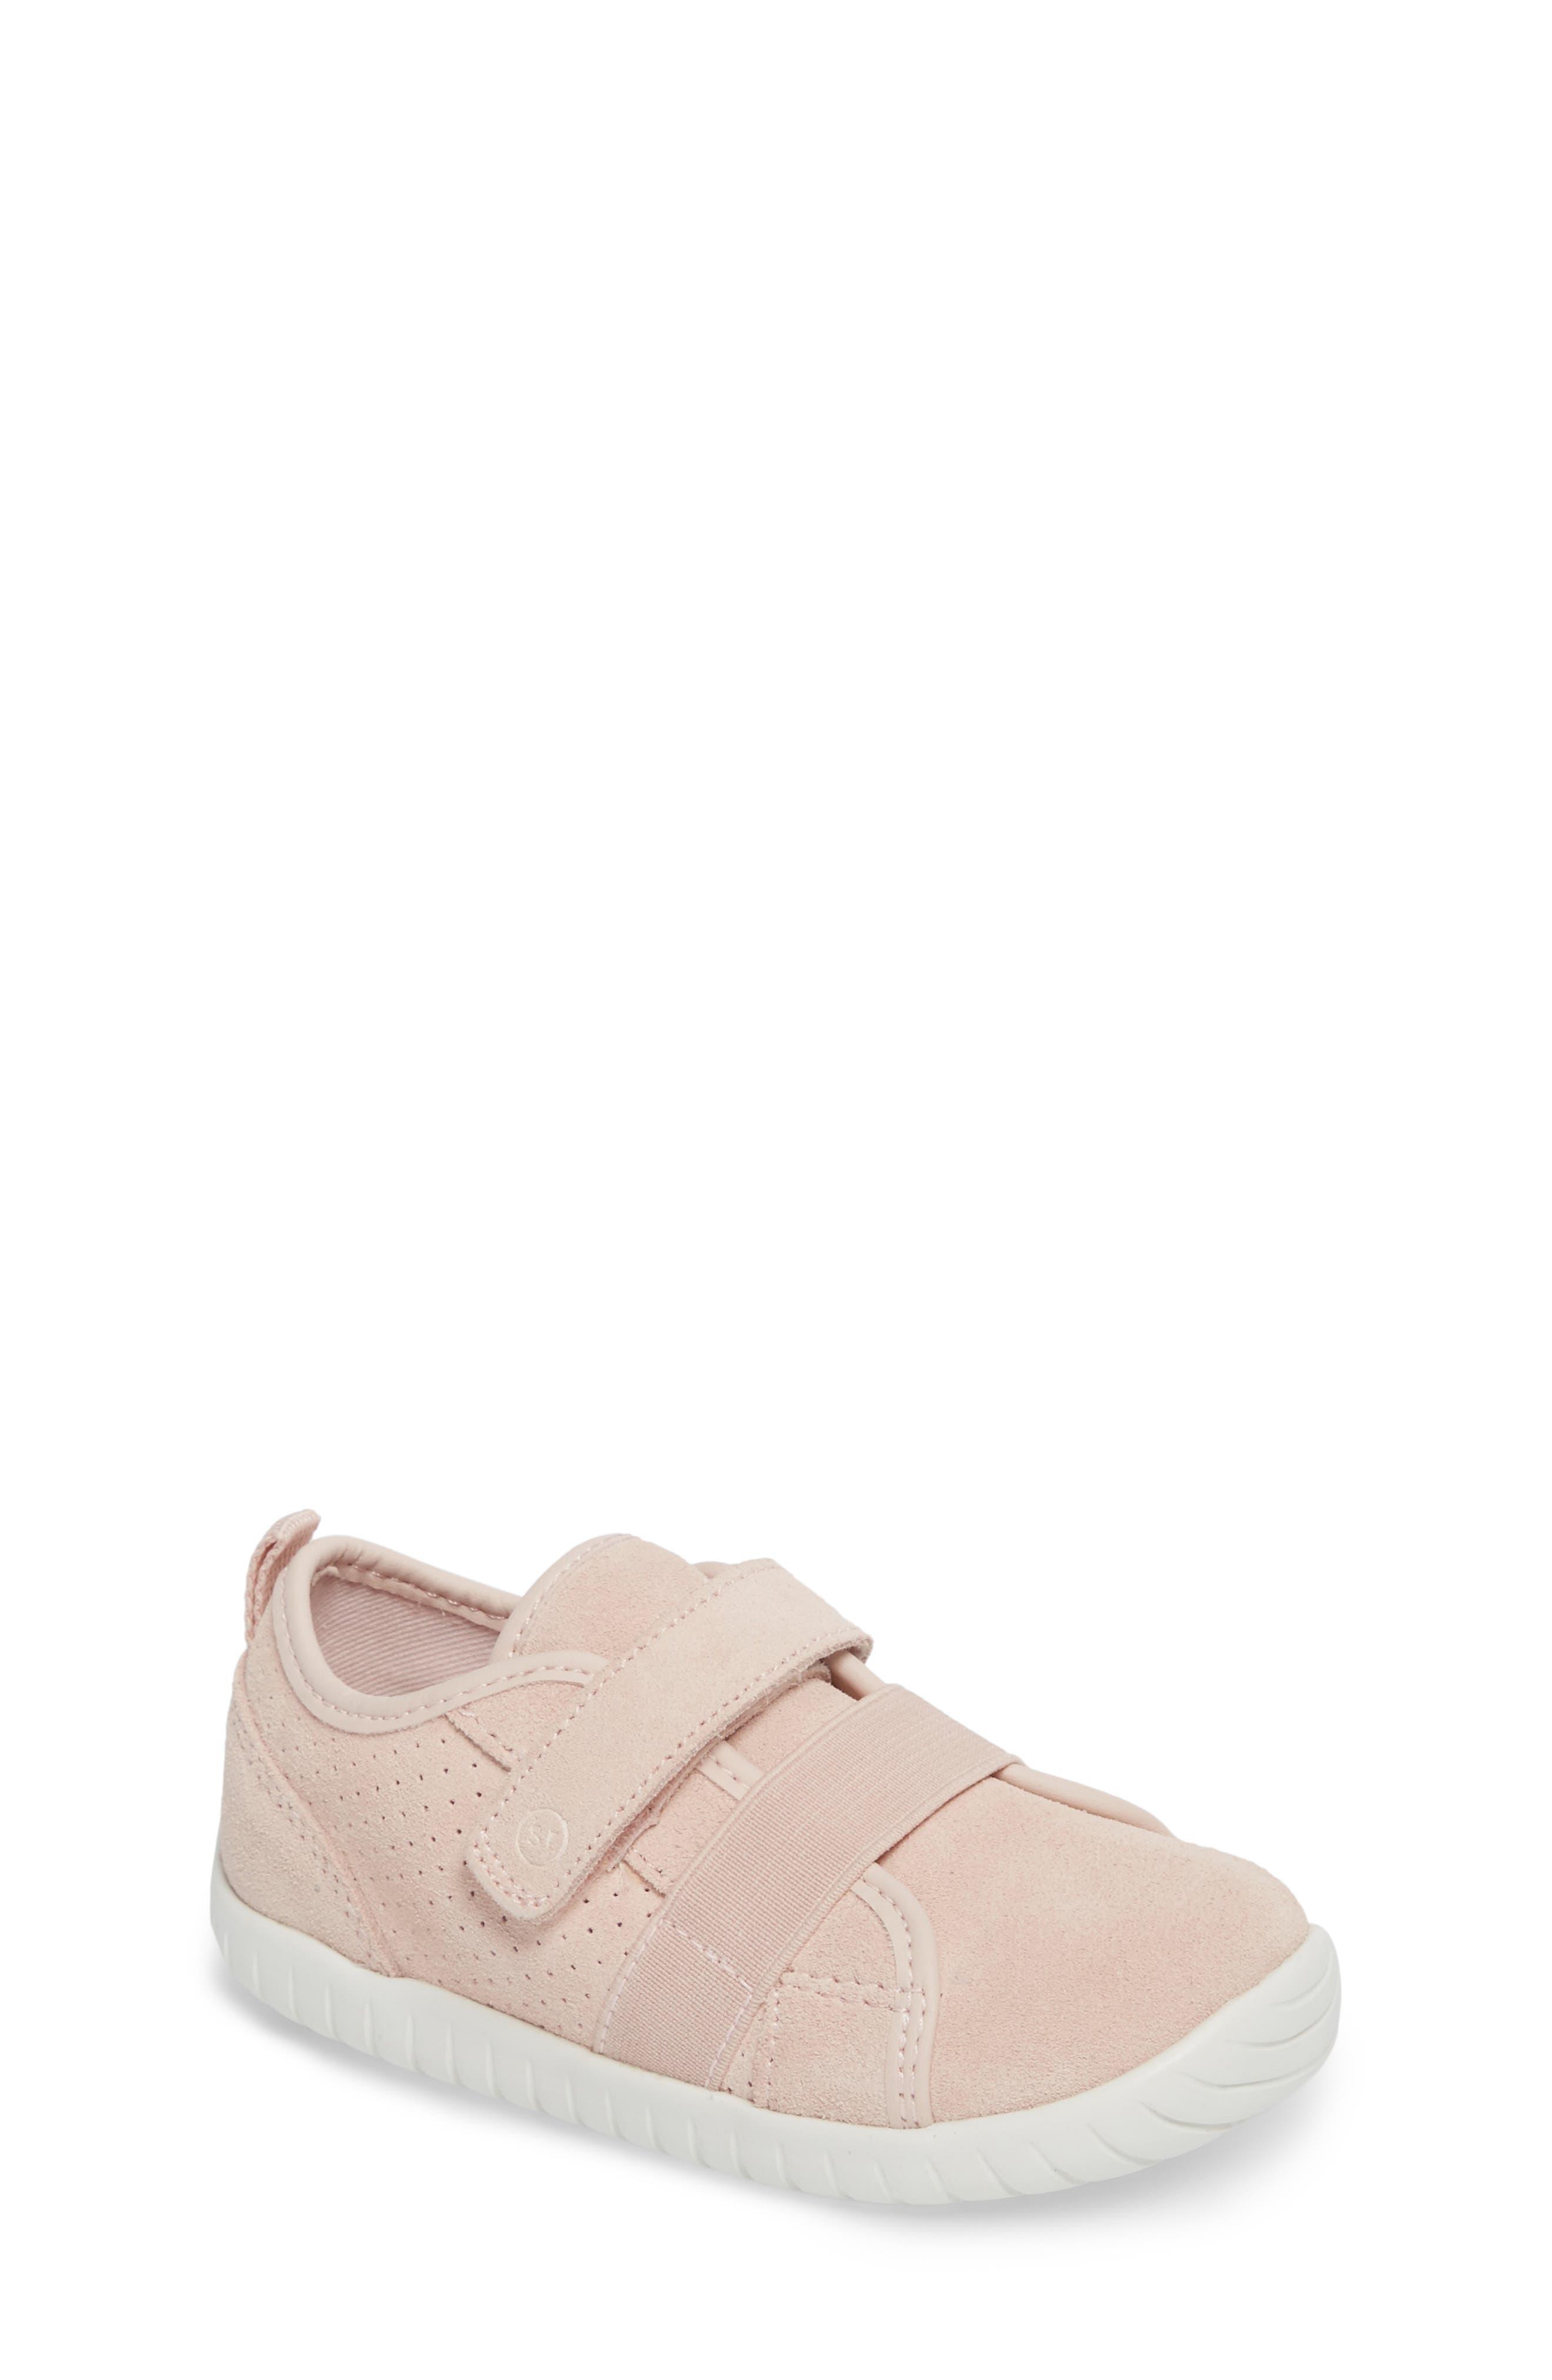 SRtech<sup>™</sup> Riley Sneaker,                             Main thumbnail 1, color,                             Blush Leather